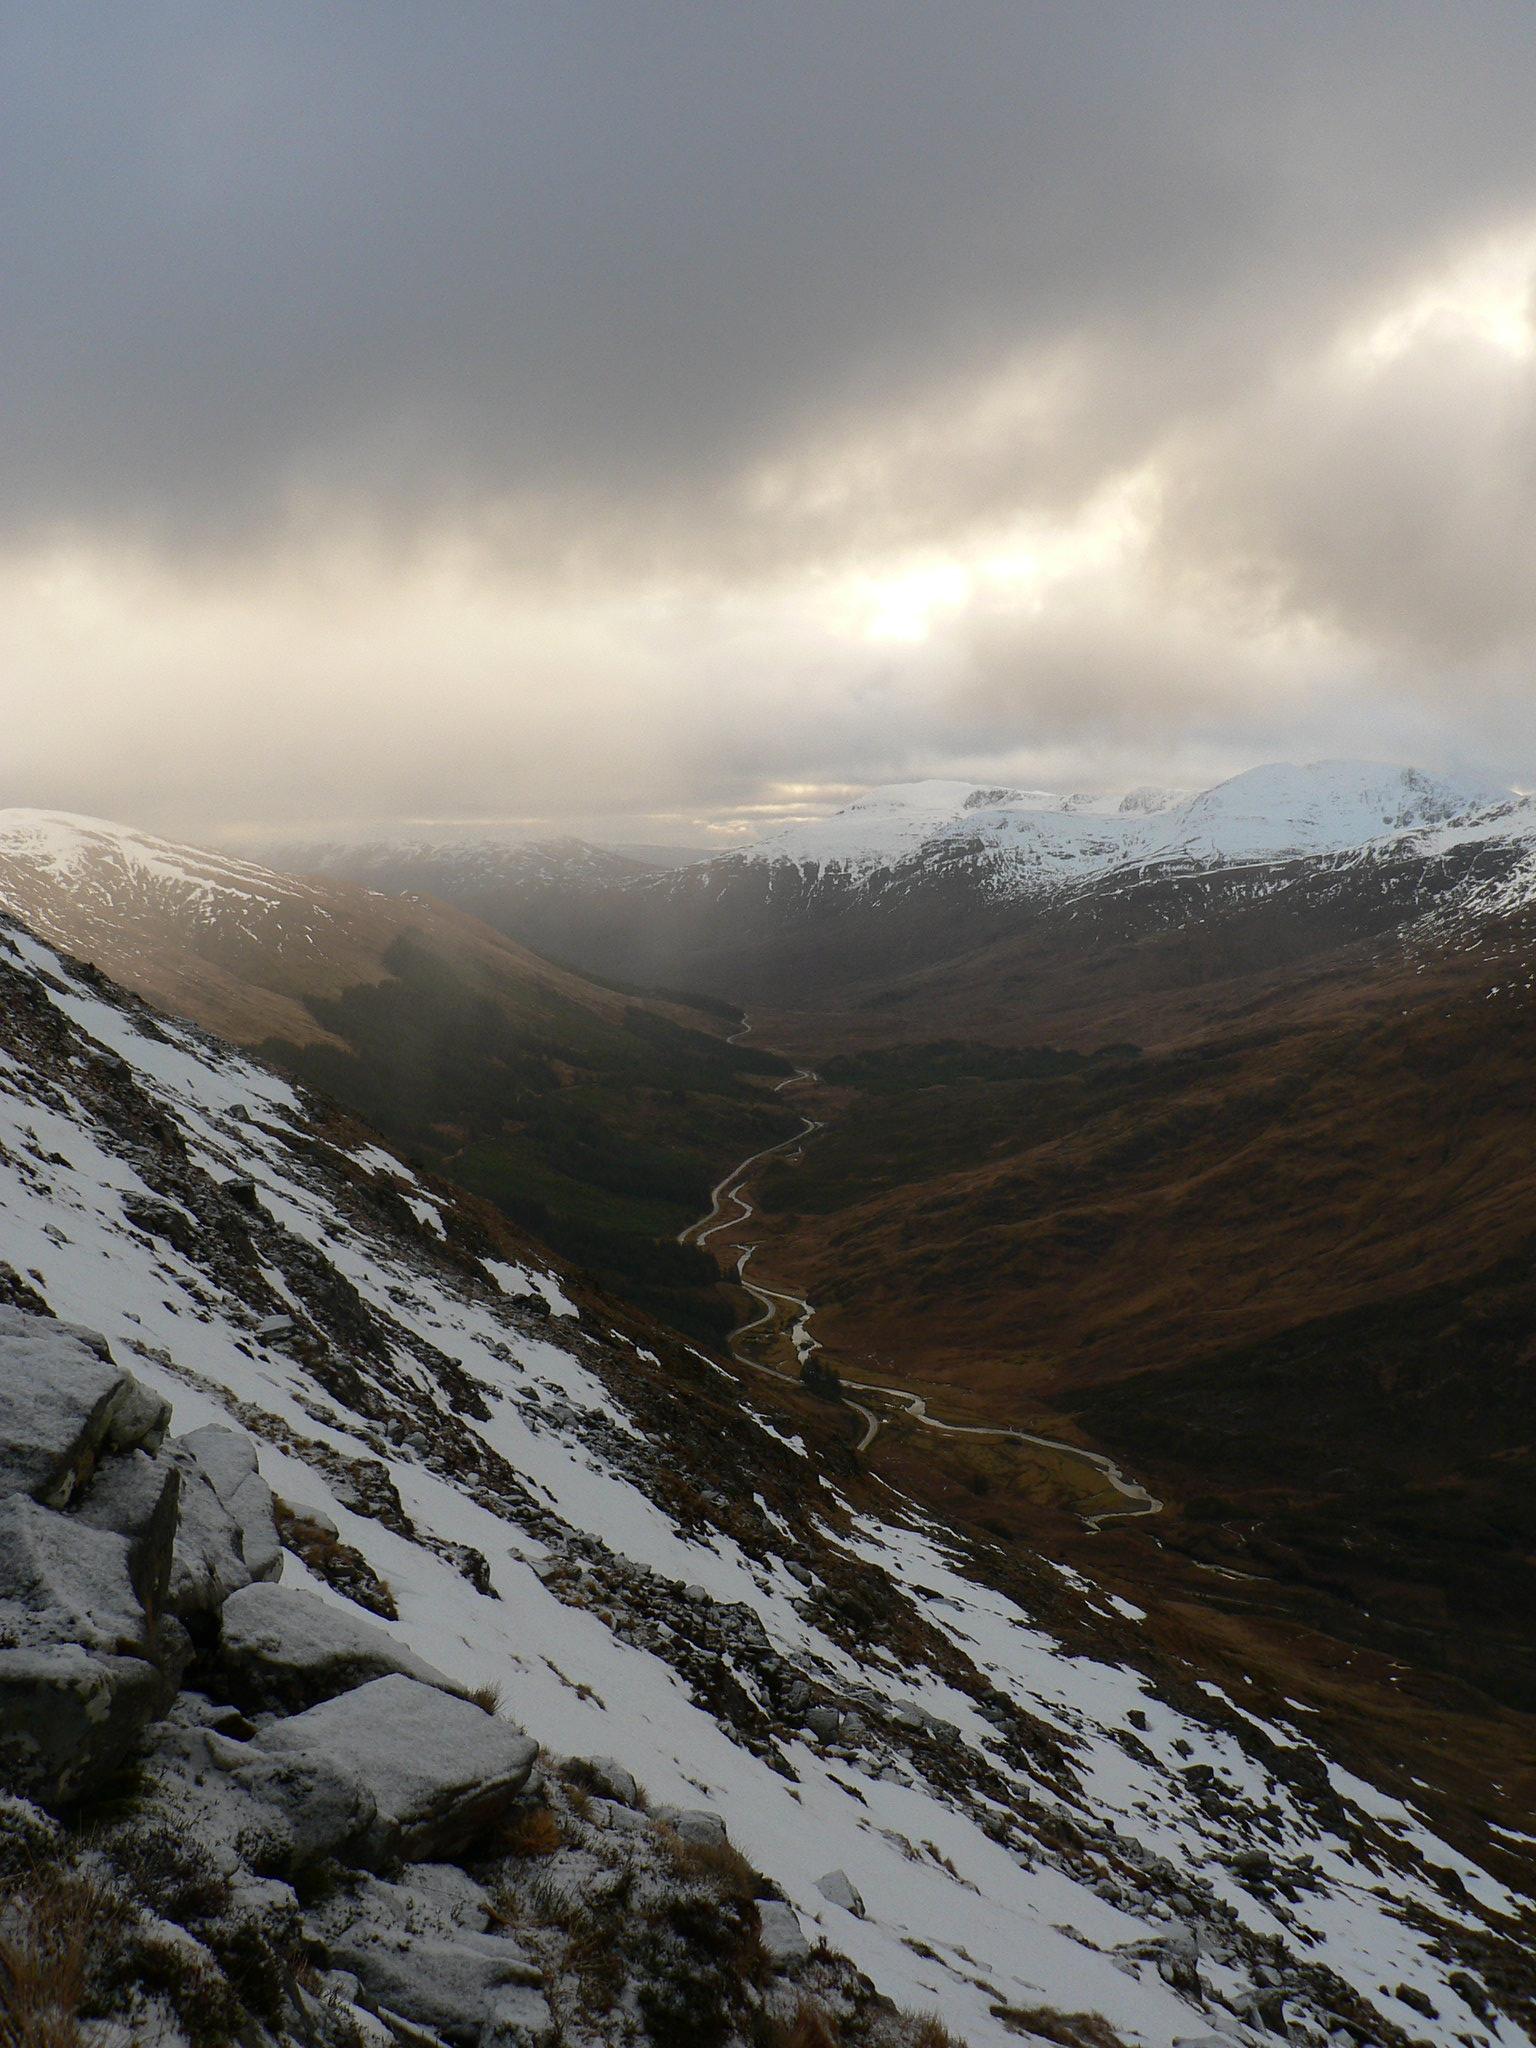 On the ascent of Sgurr nan Spainteach